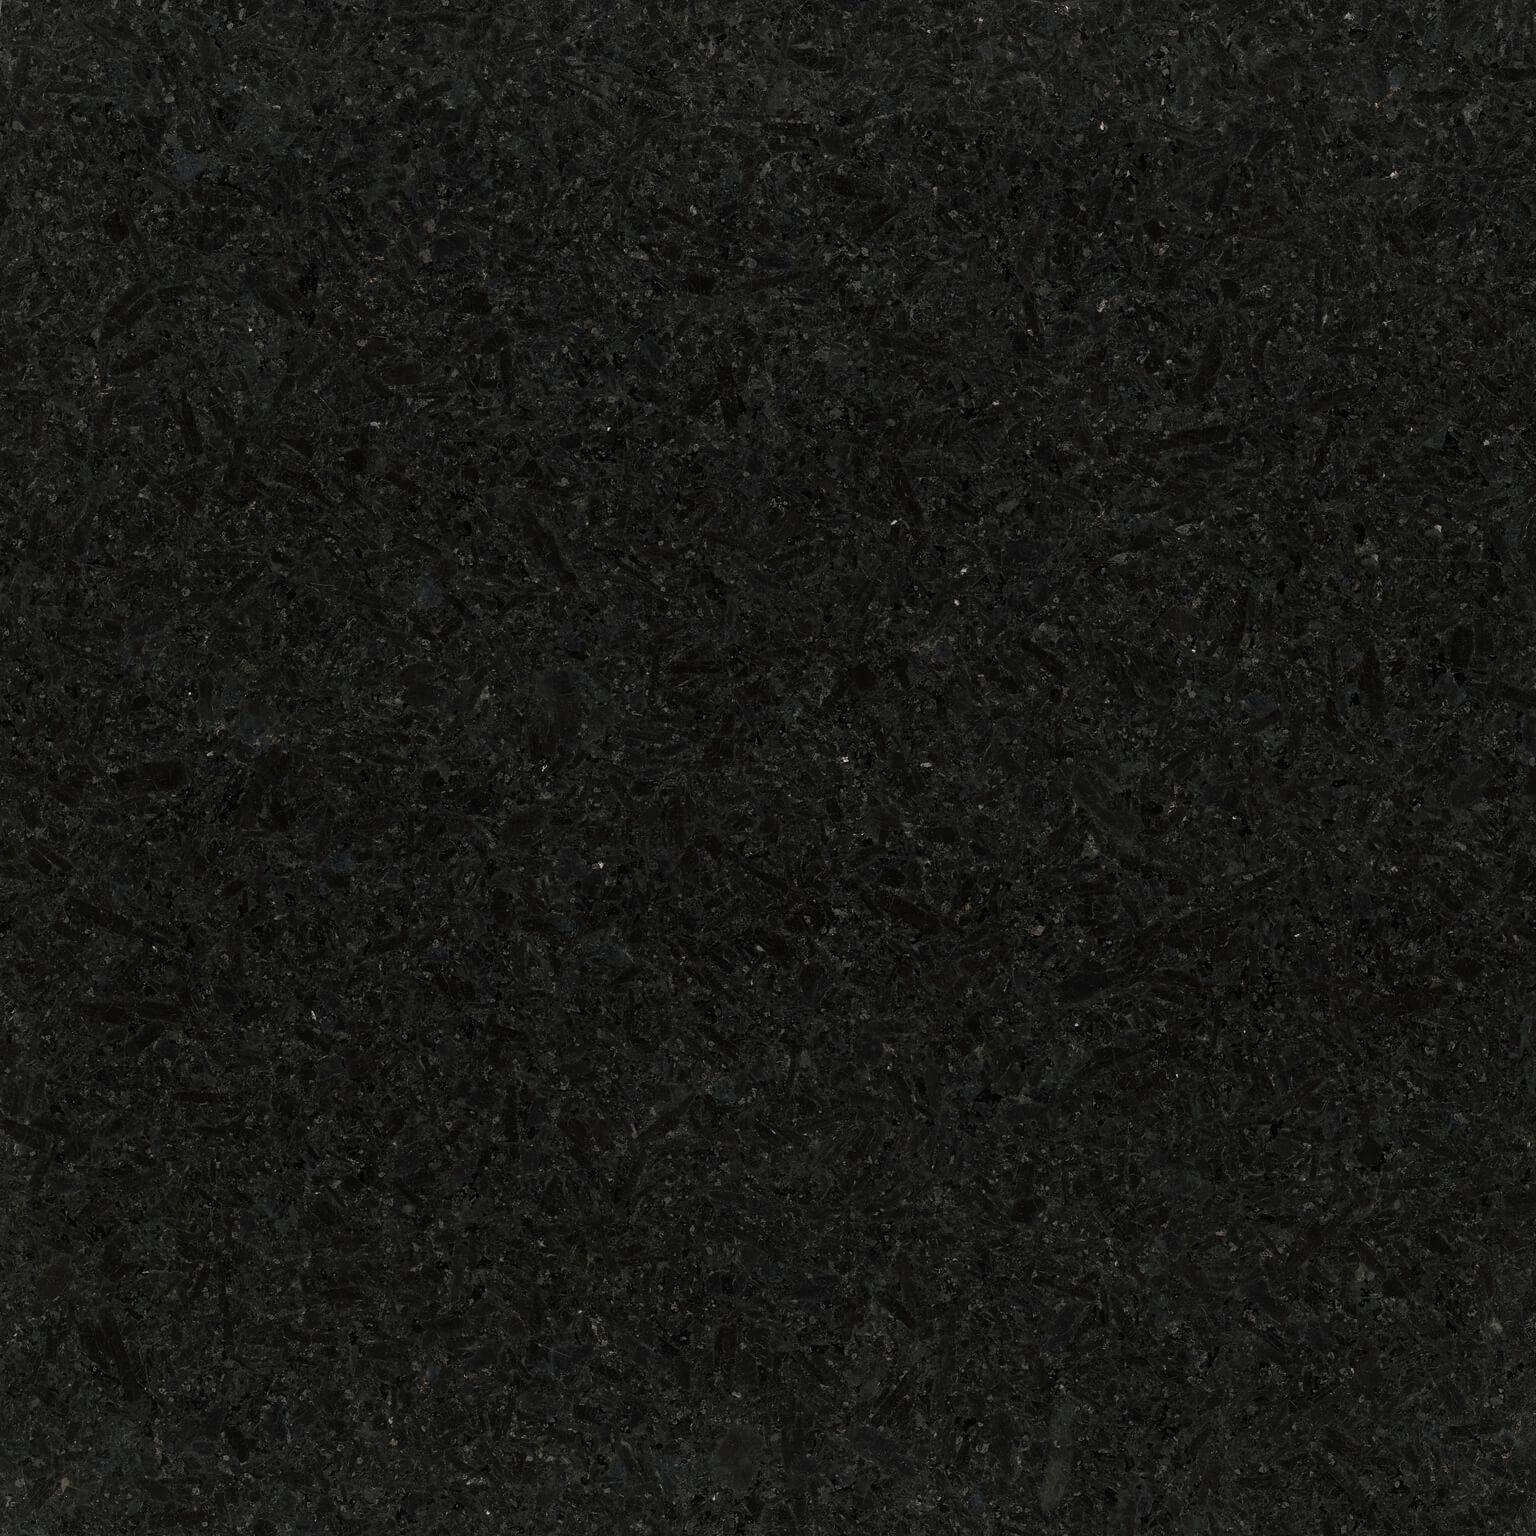 CAMBRIAN BLACK Granite Natural Stones Polycor : cambrian black polished granite polycor full from www.polycor.com size 1536 x 1536 jpeg 400kB